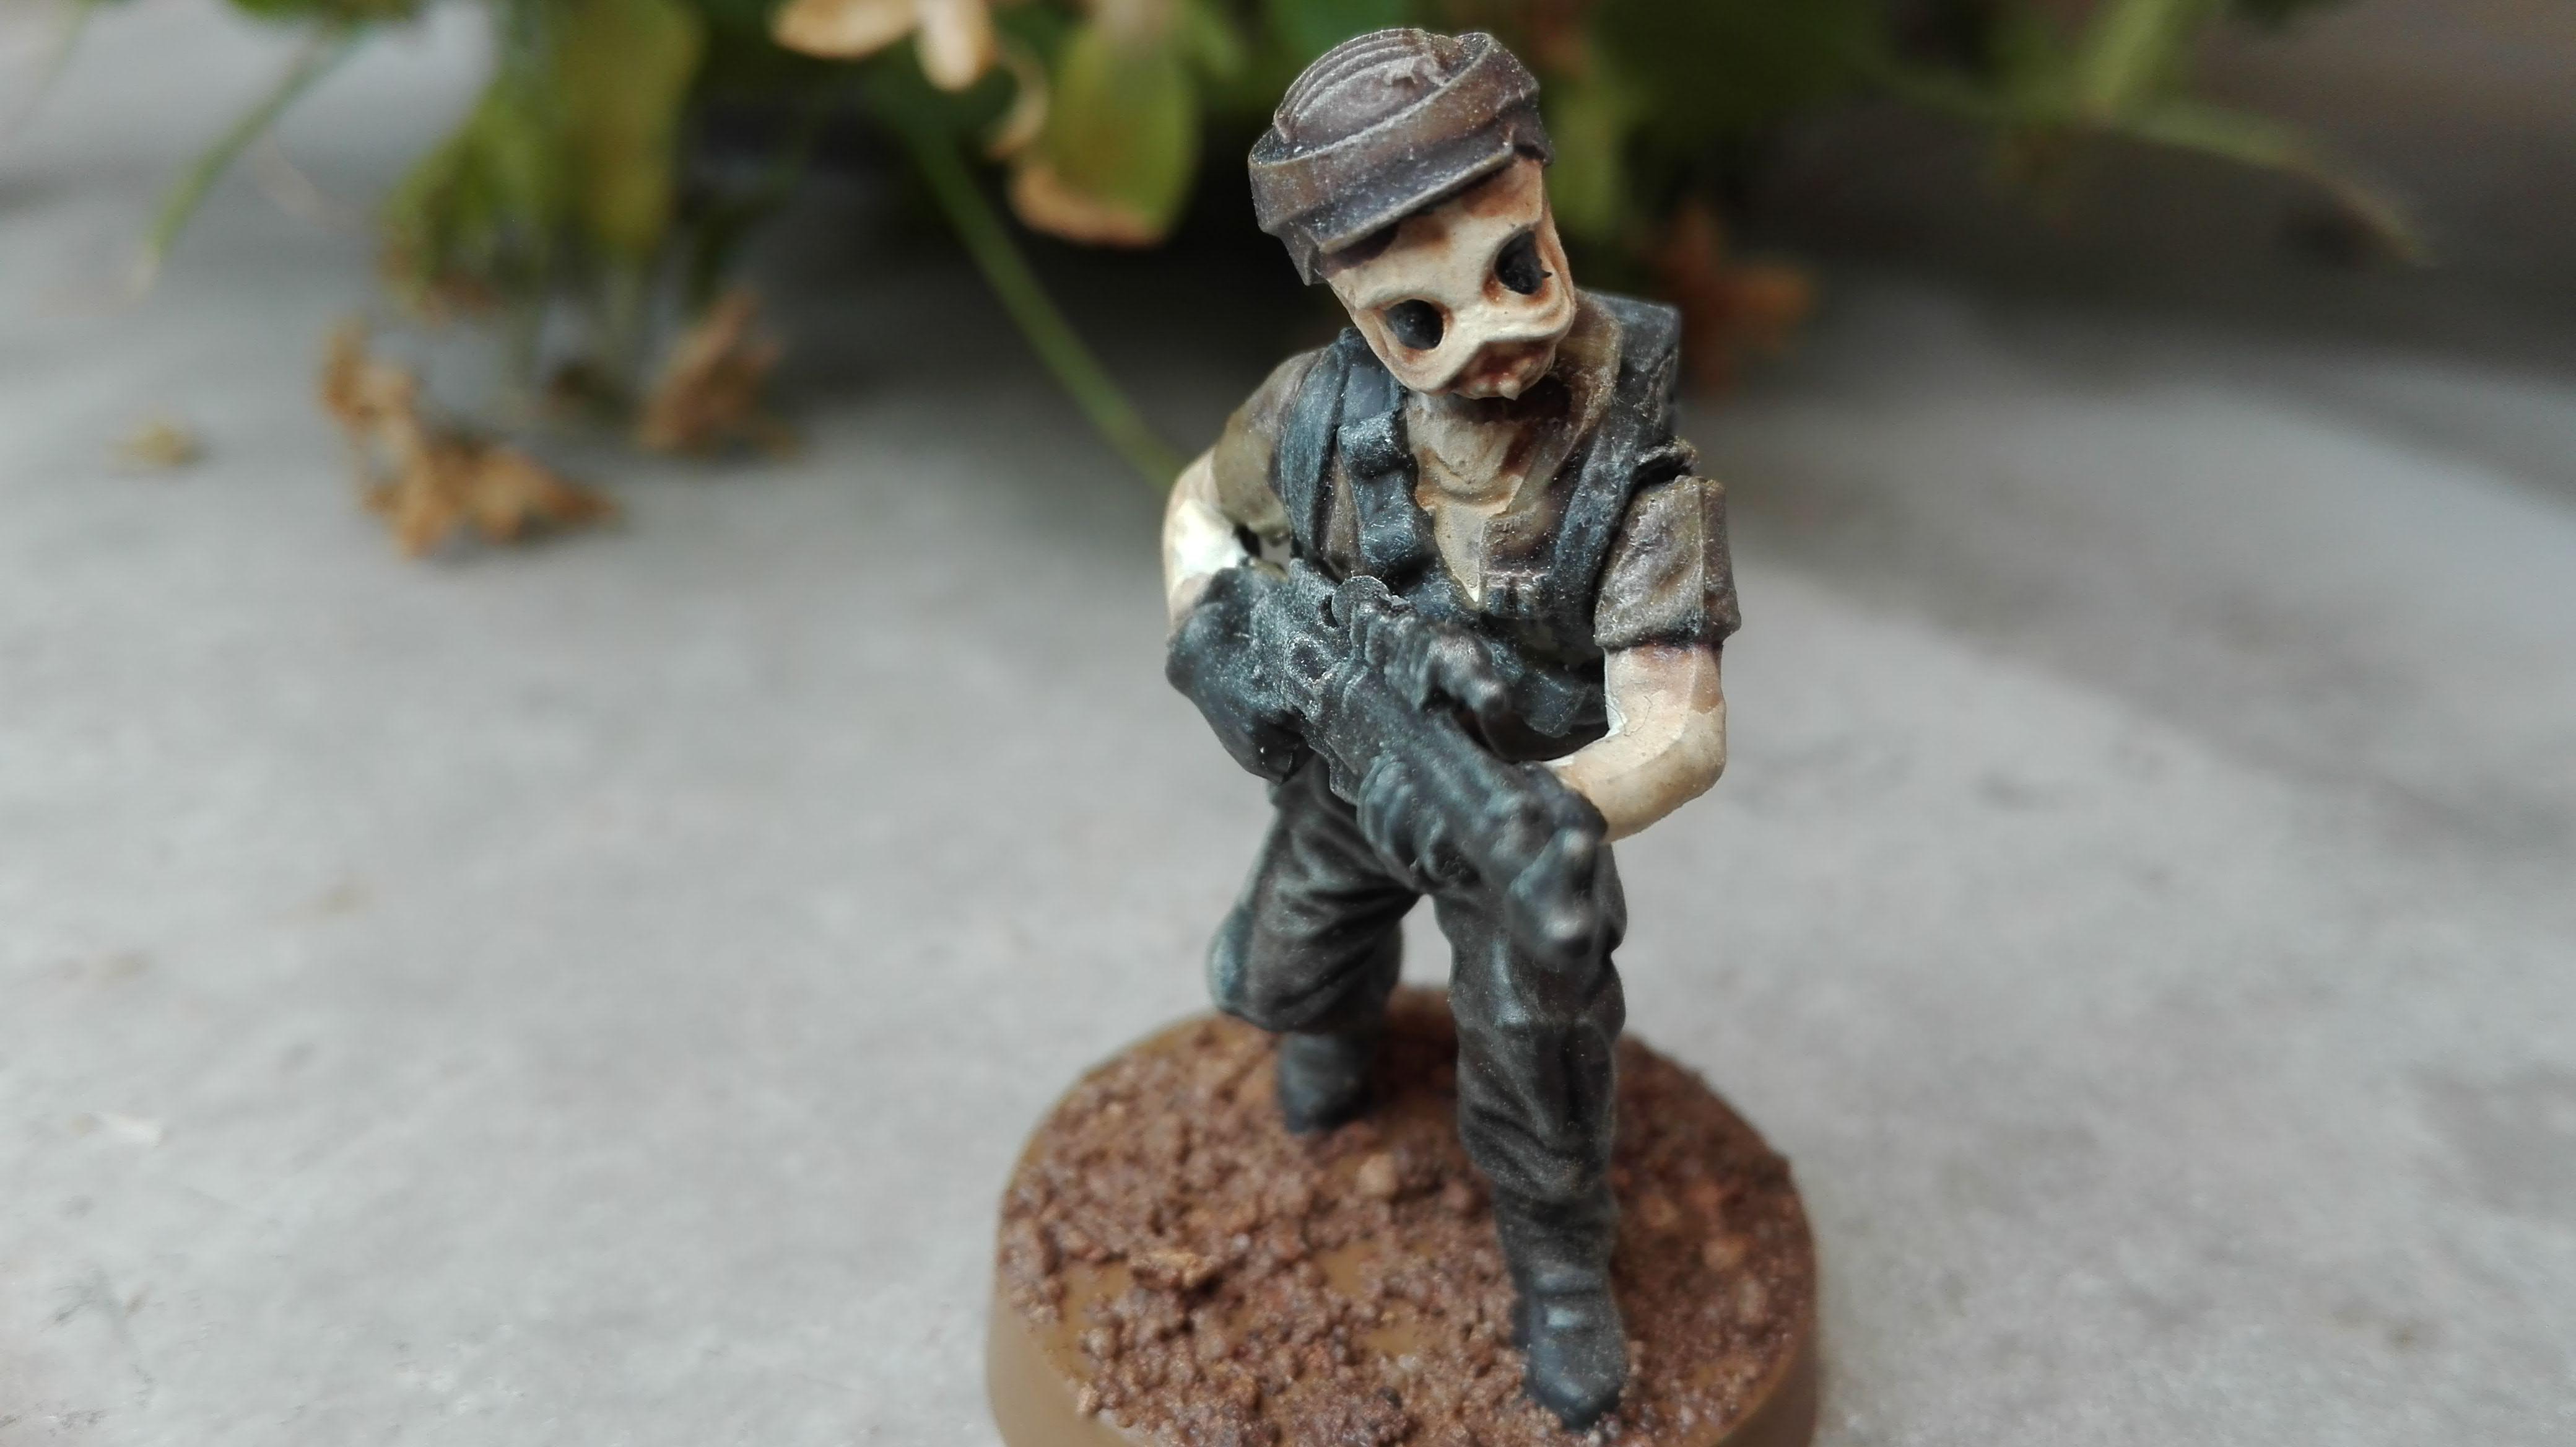 [Legion]Halvarsons rebellischer Sohn Img-2014